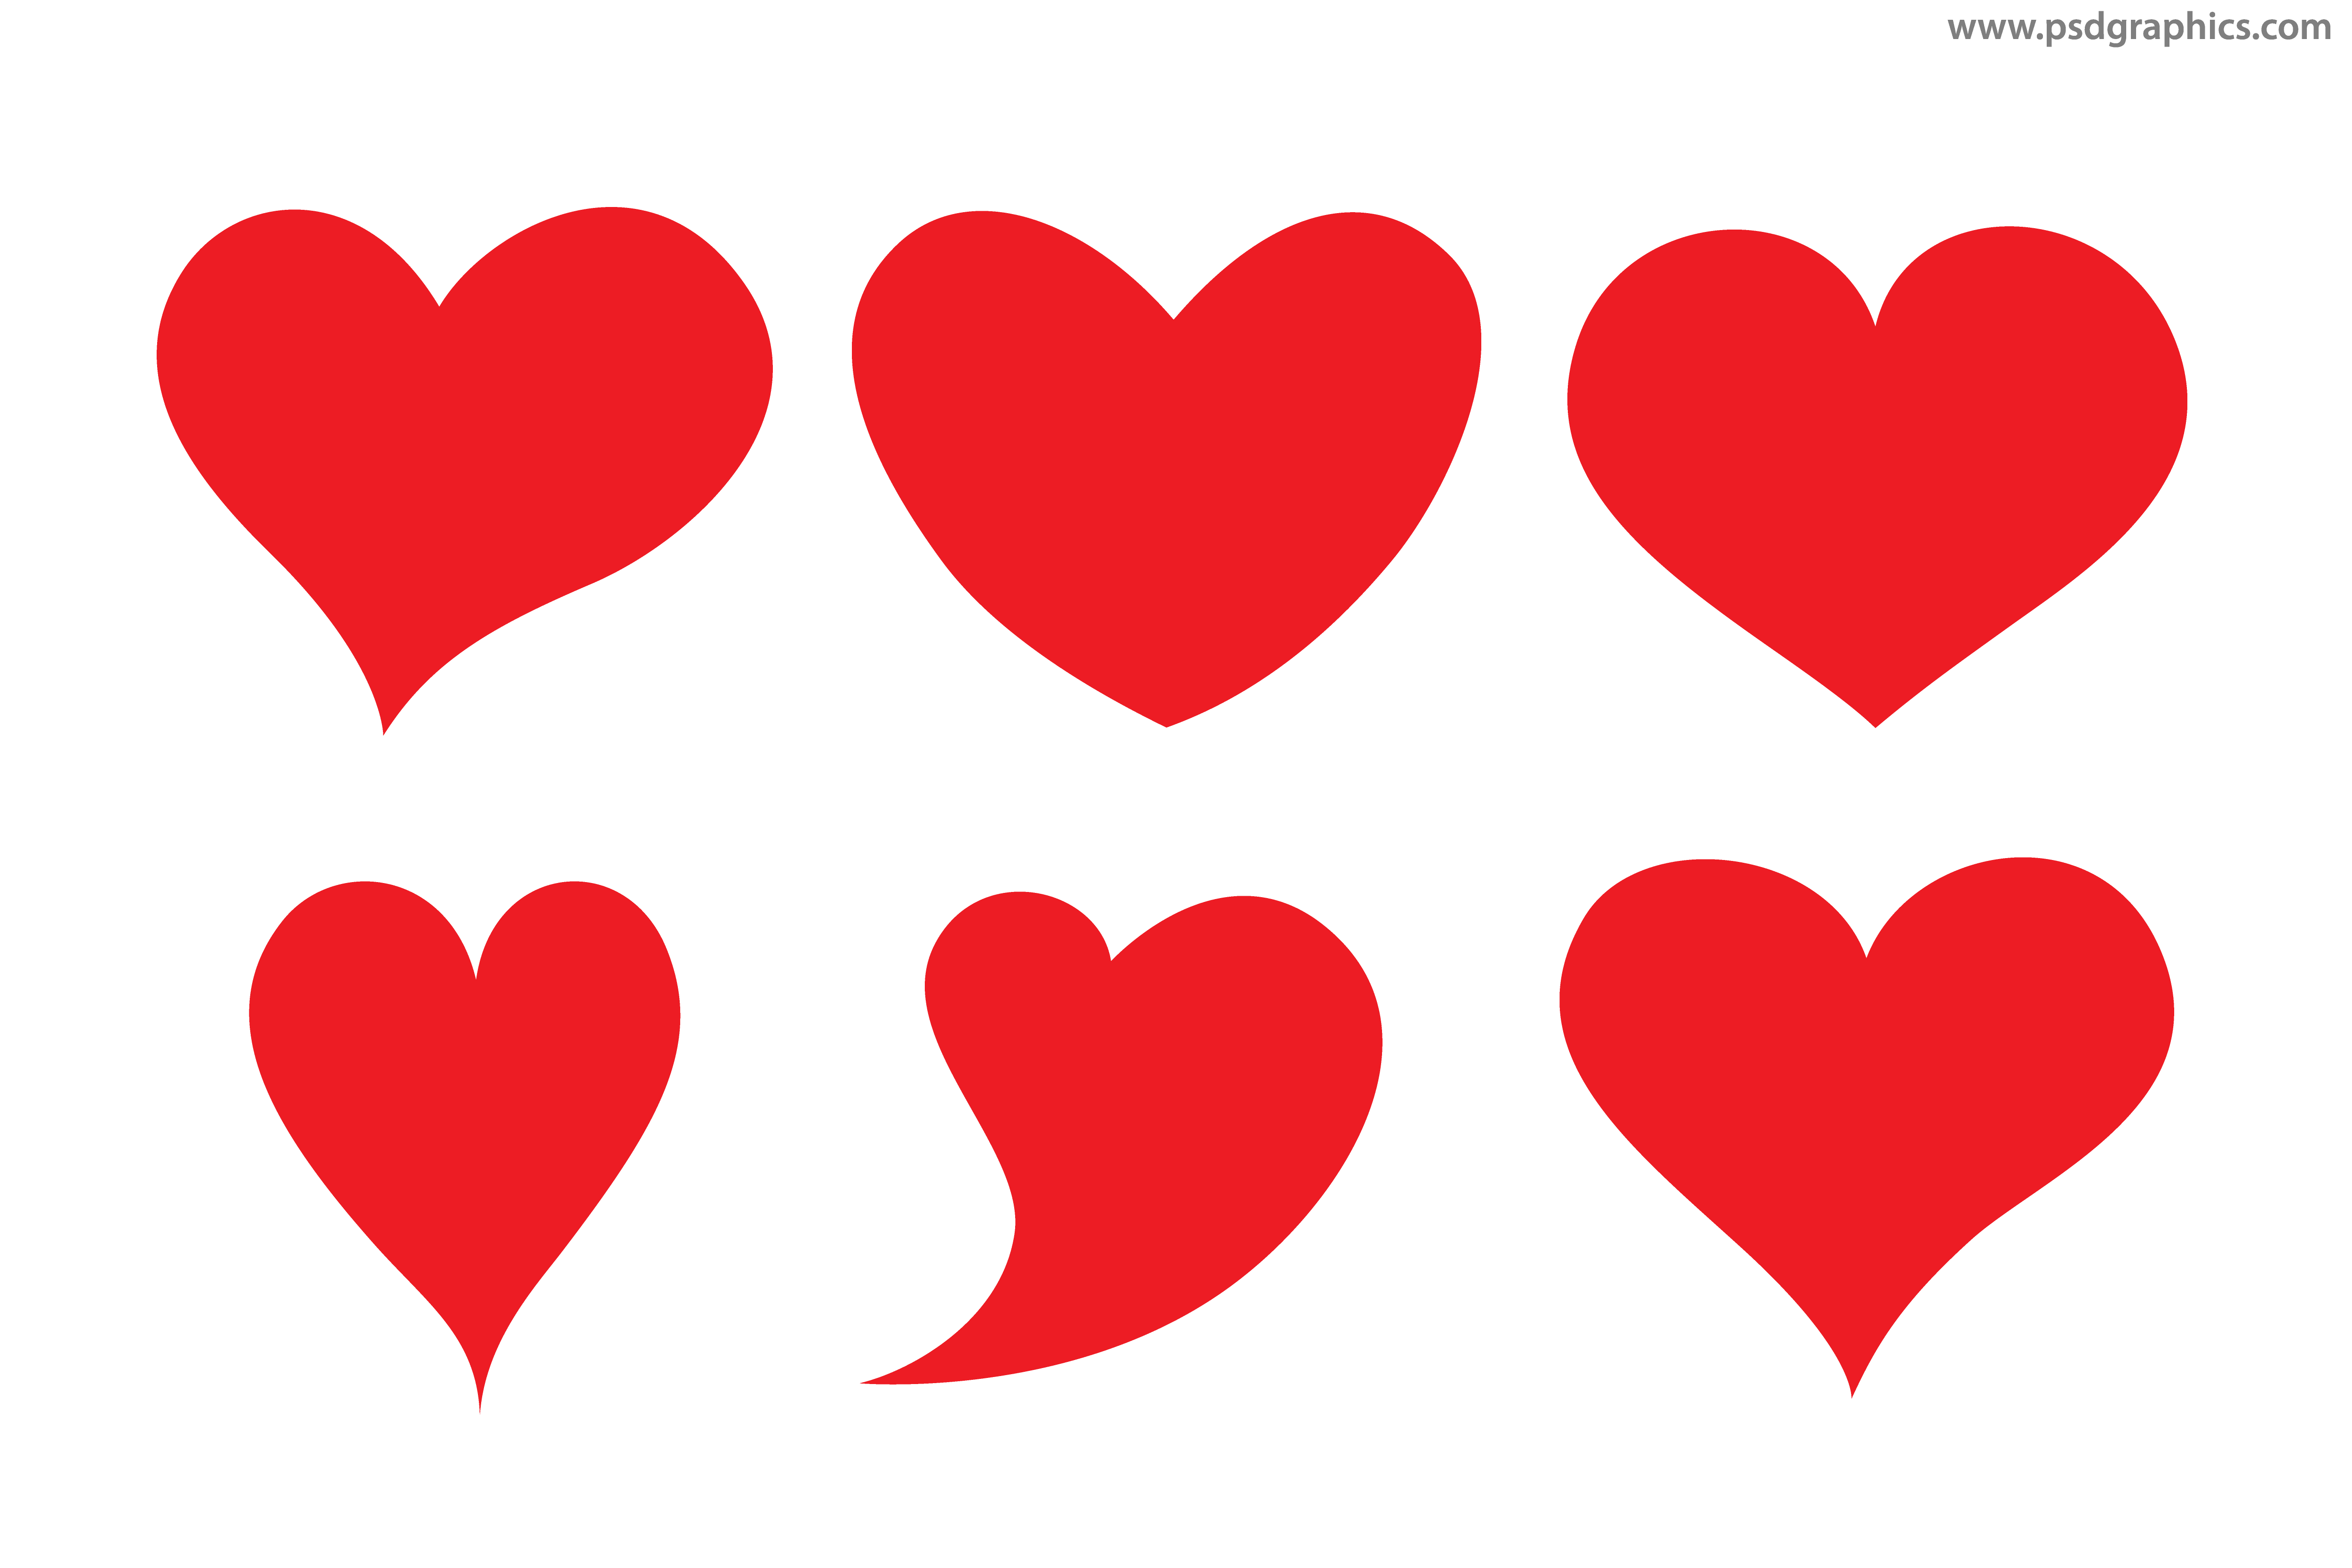 Hearts shapes psdgraphics. Heart vector png